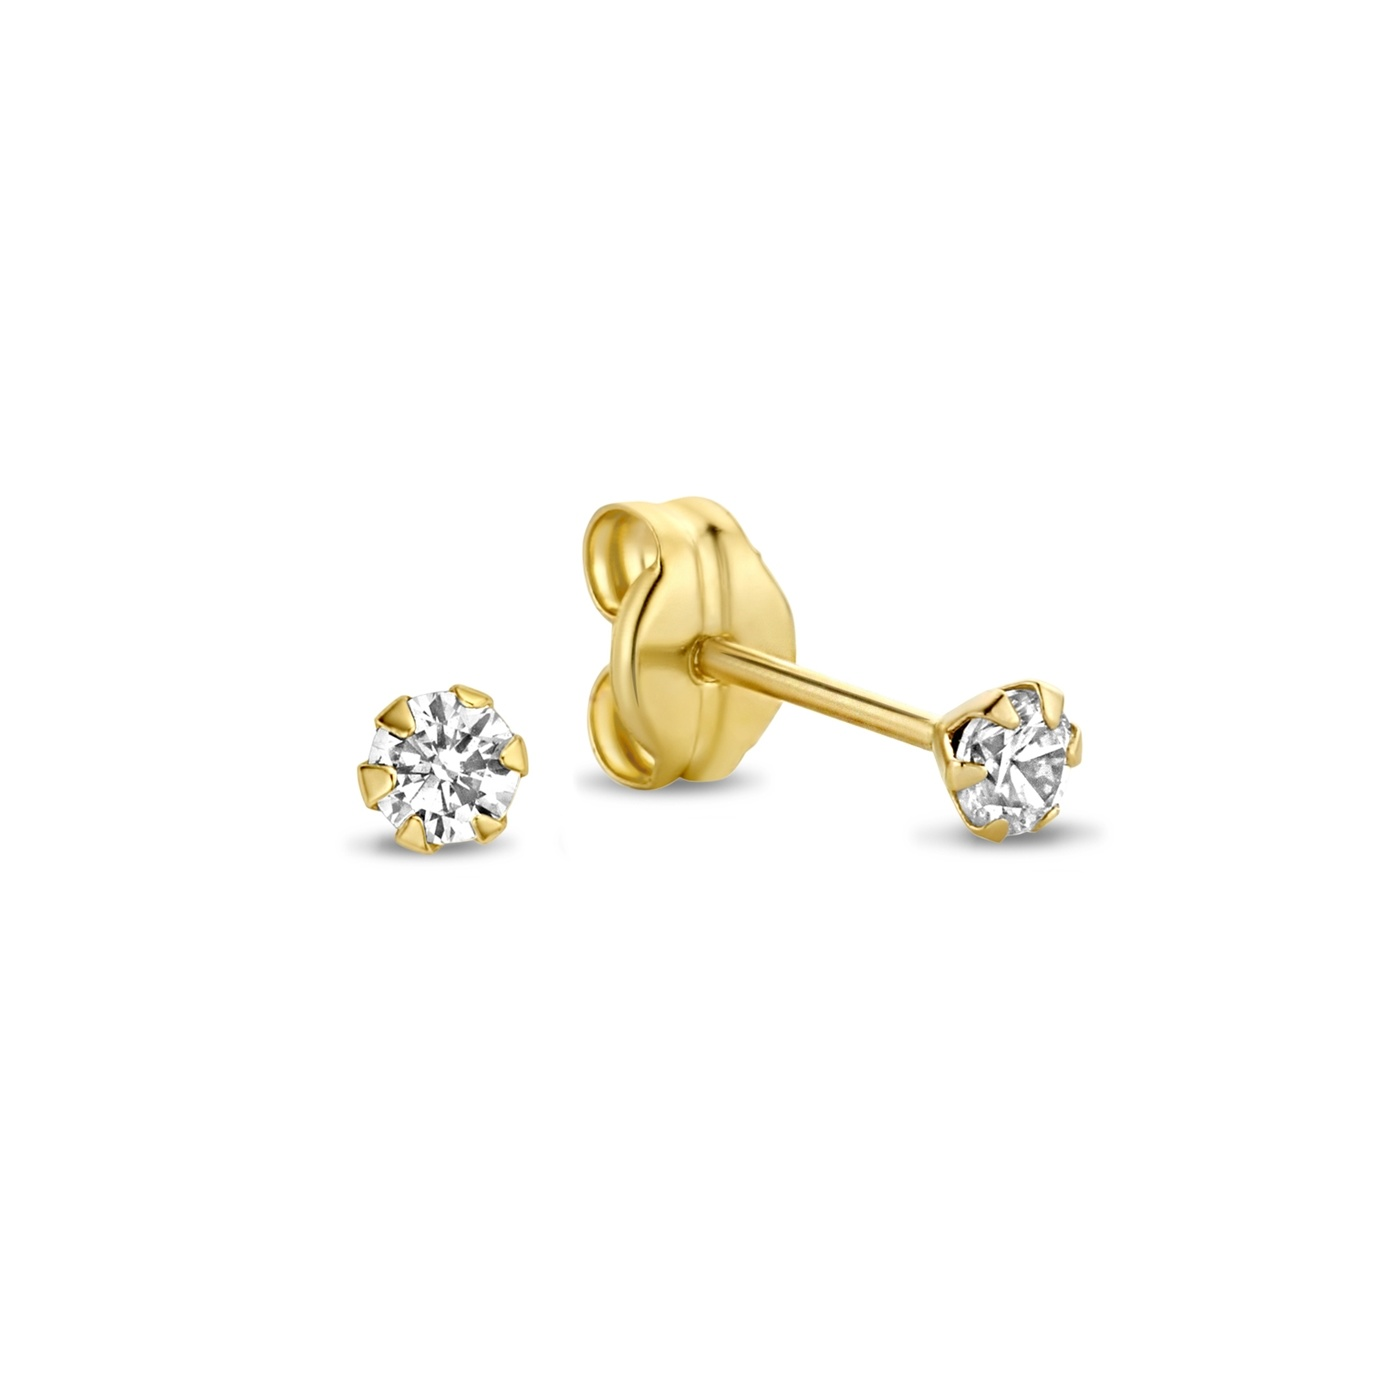 Isabel Bernard Rivoli Elise 14 karat gold ear studs with zirconia